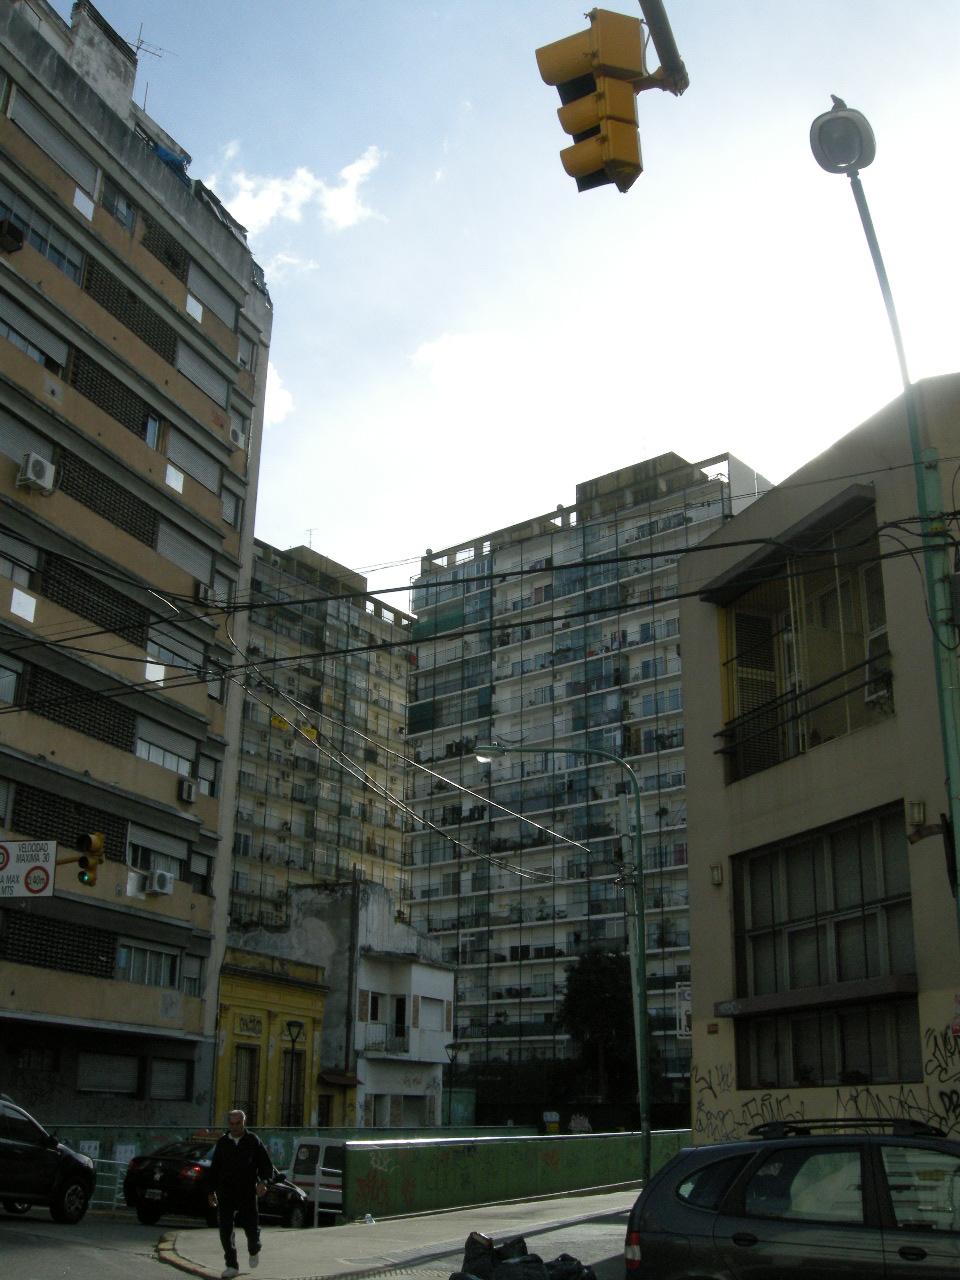 Lezica con Yatai, Buenos Aires